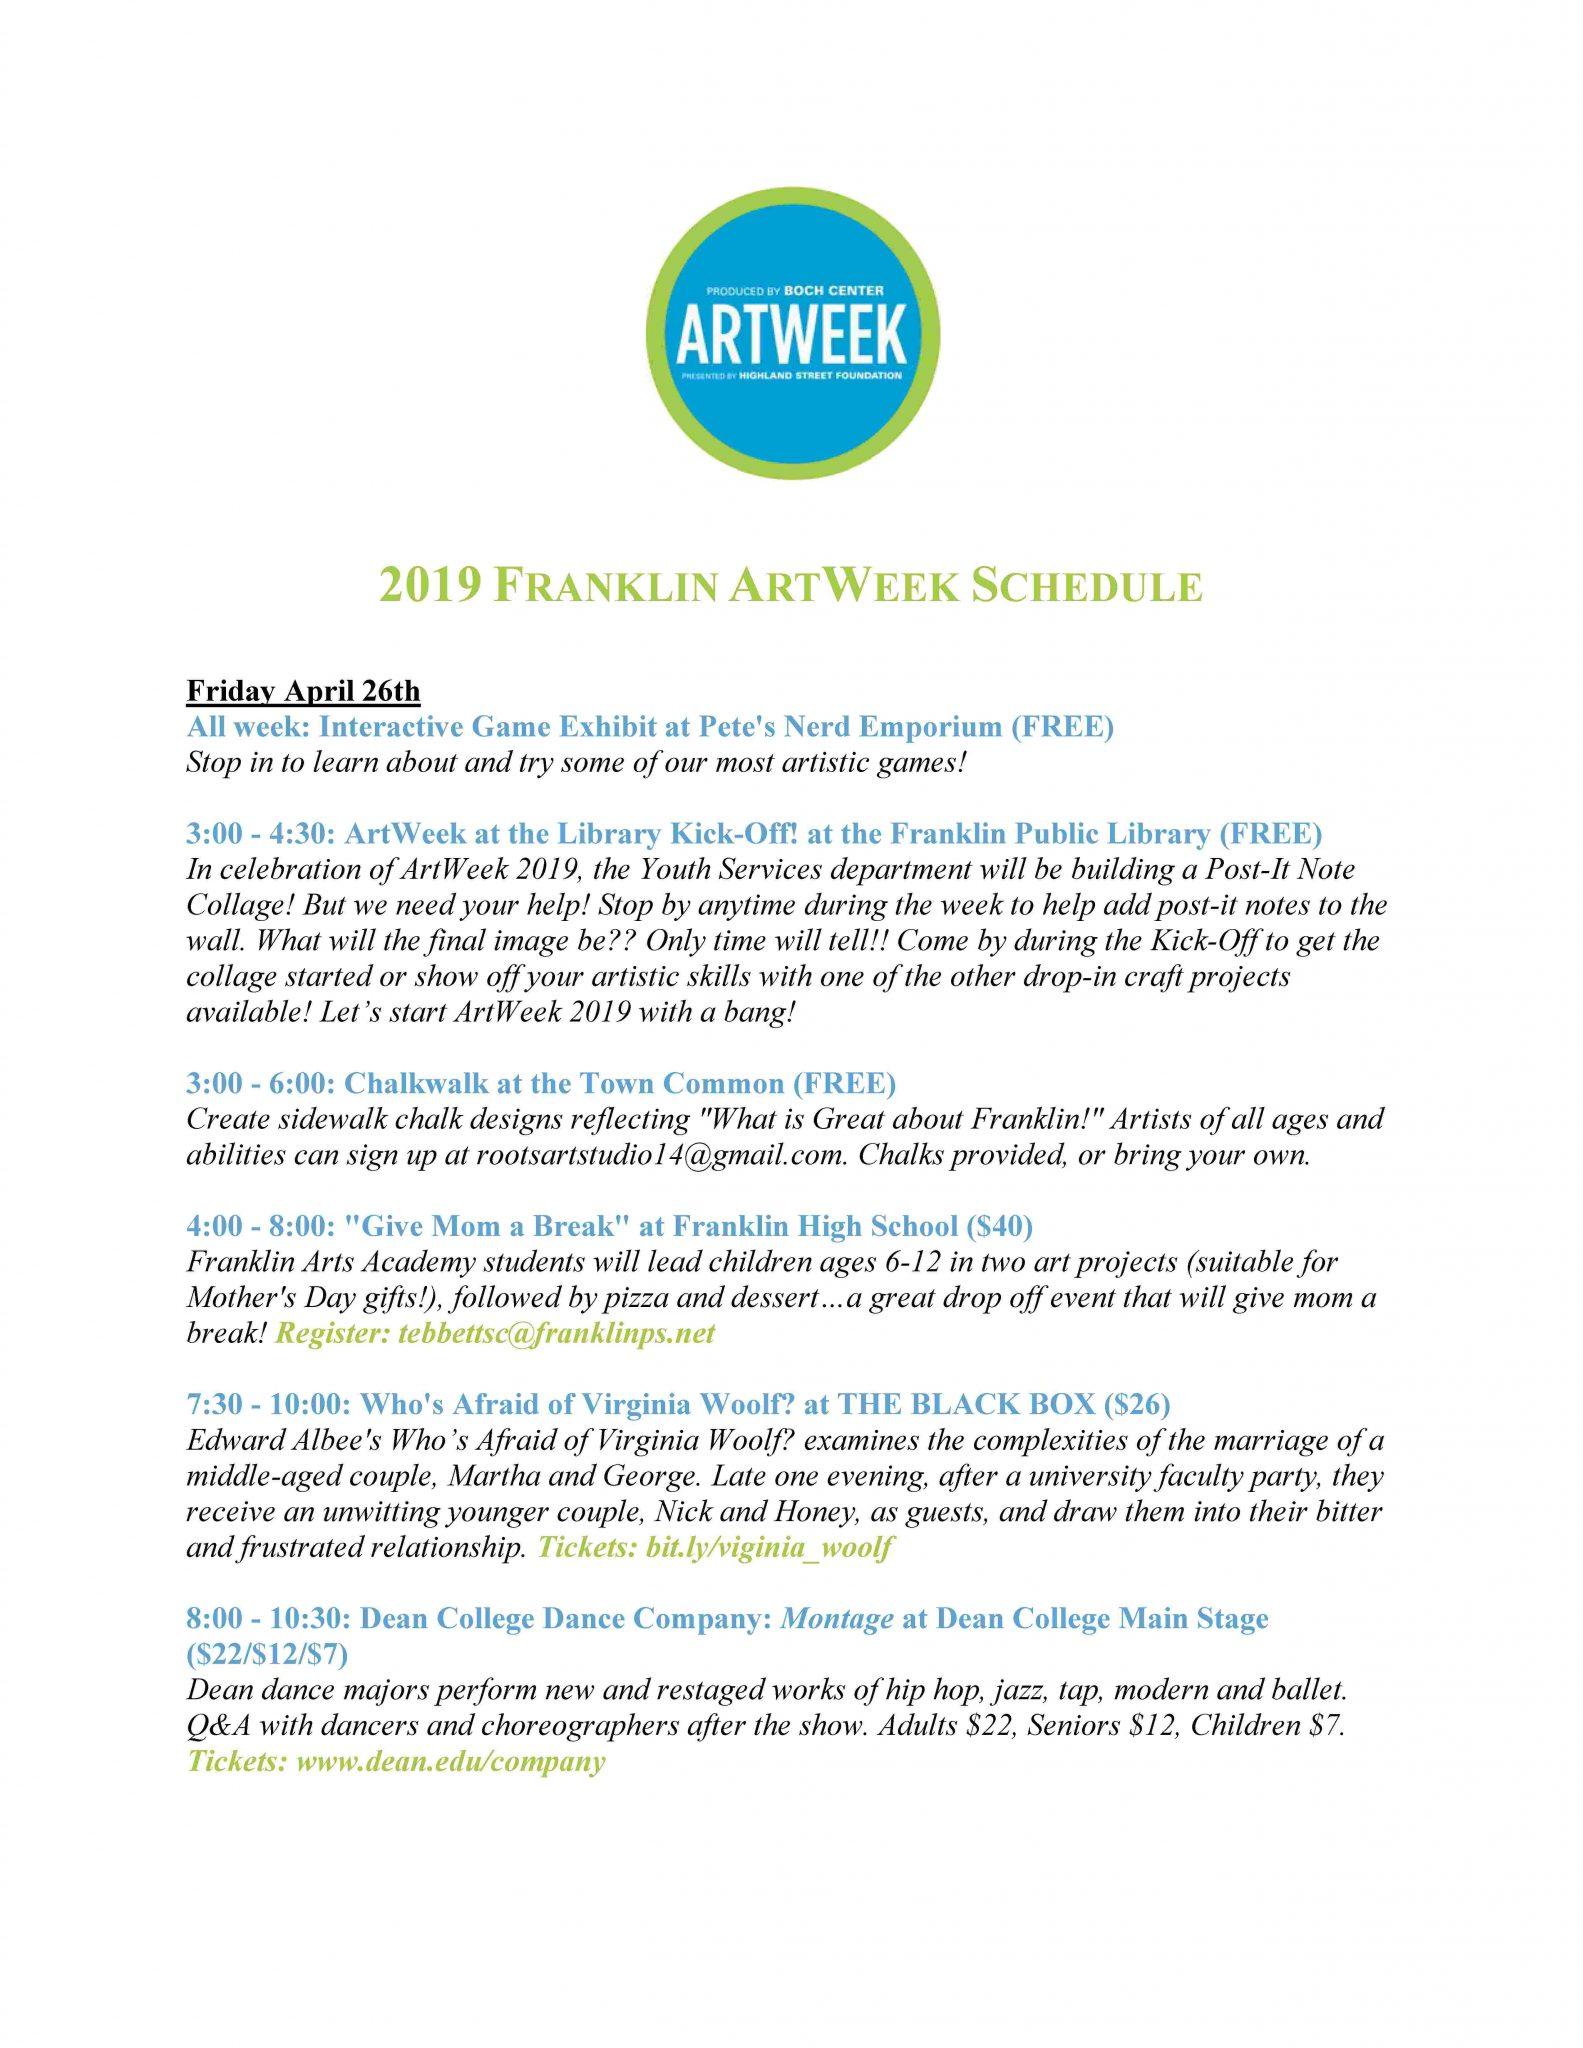 ArtWeekFranlin MA schedule